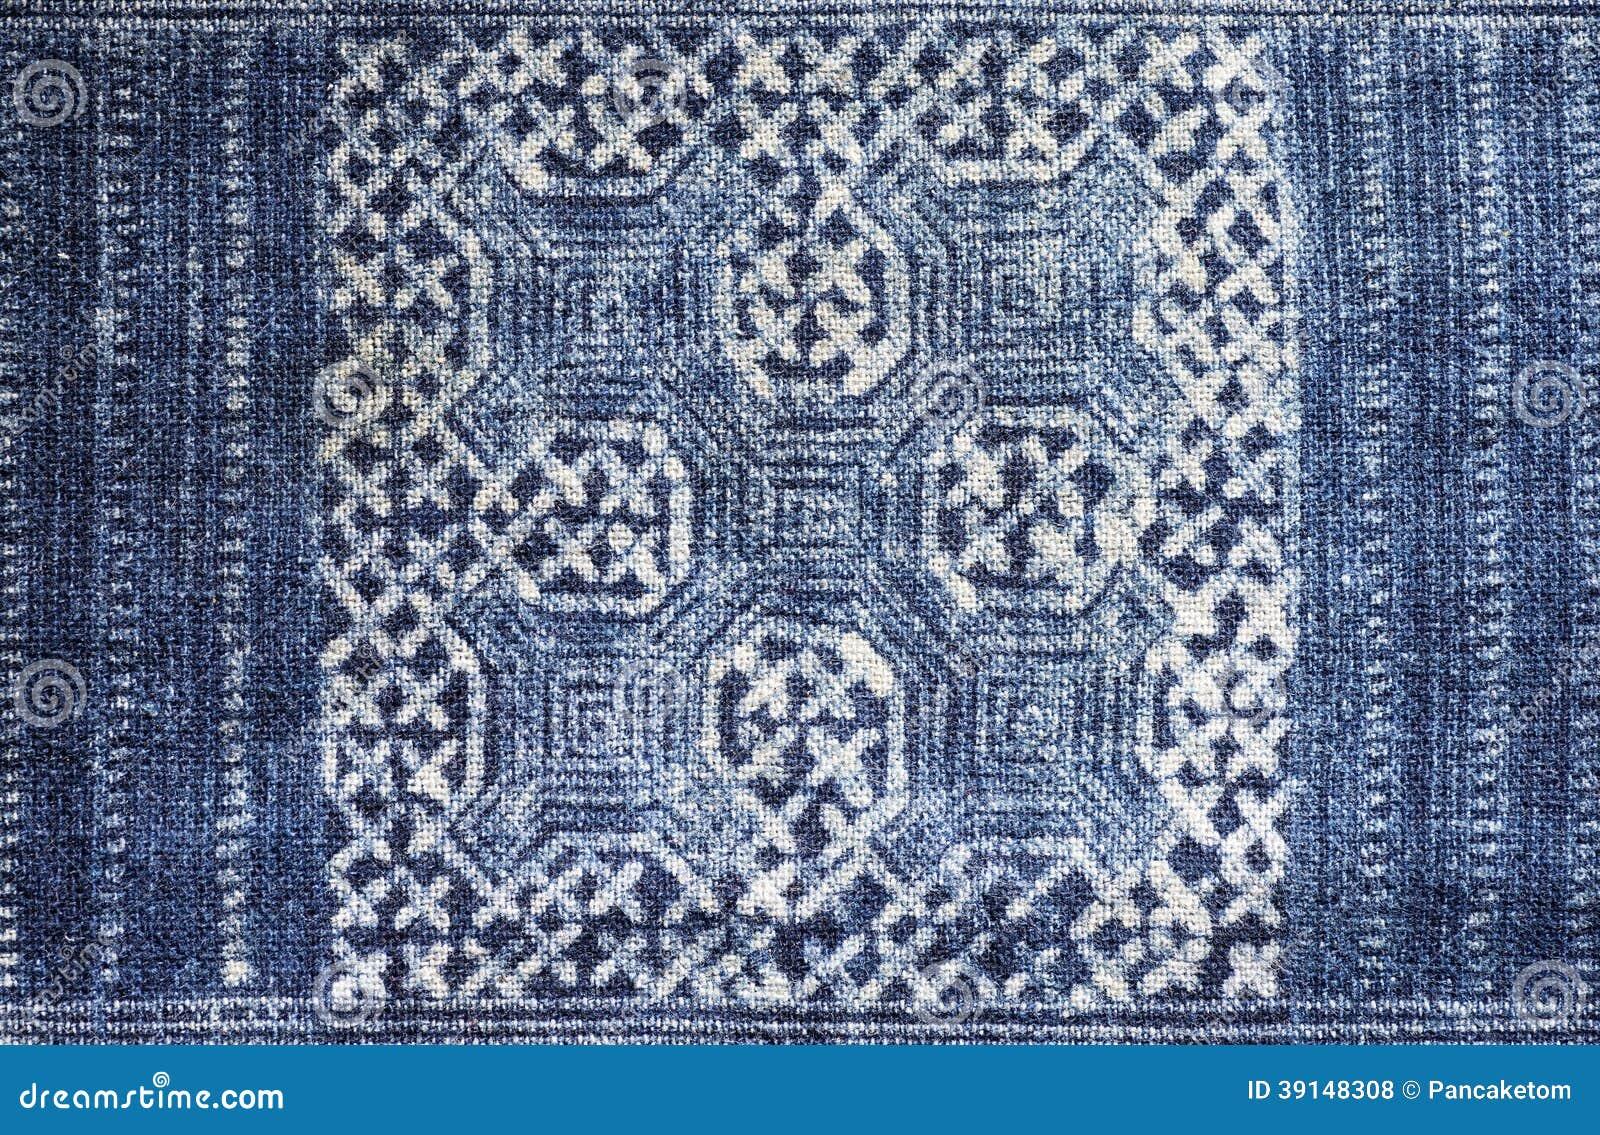 indigo dyed batik cloth stock photo image 39148308. Black Bedroom Furniture Sets. Home Design Ideas